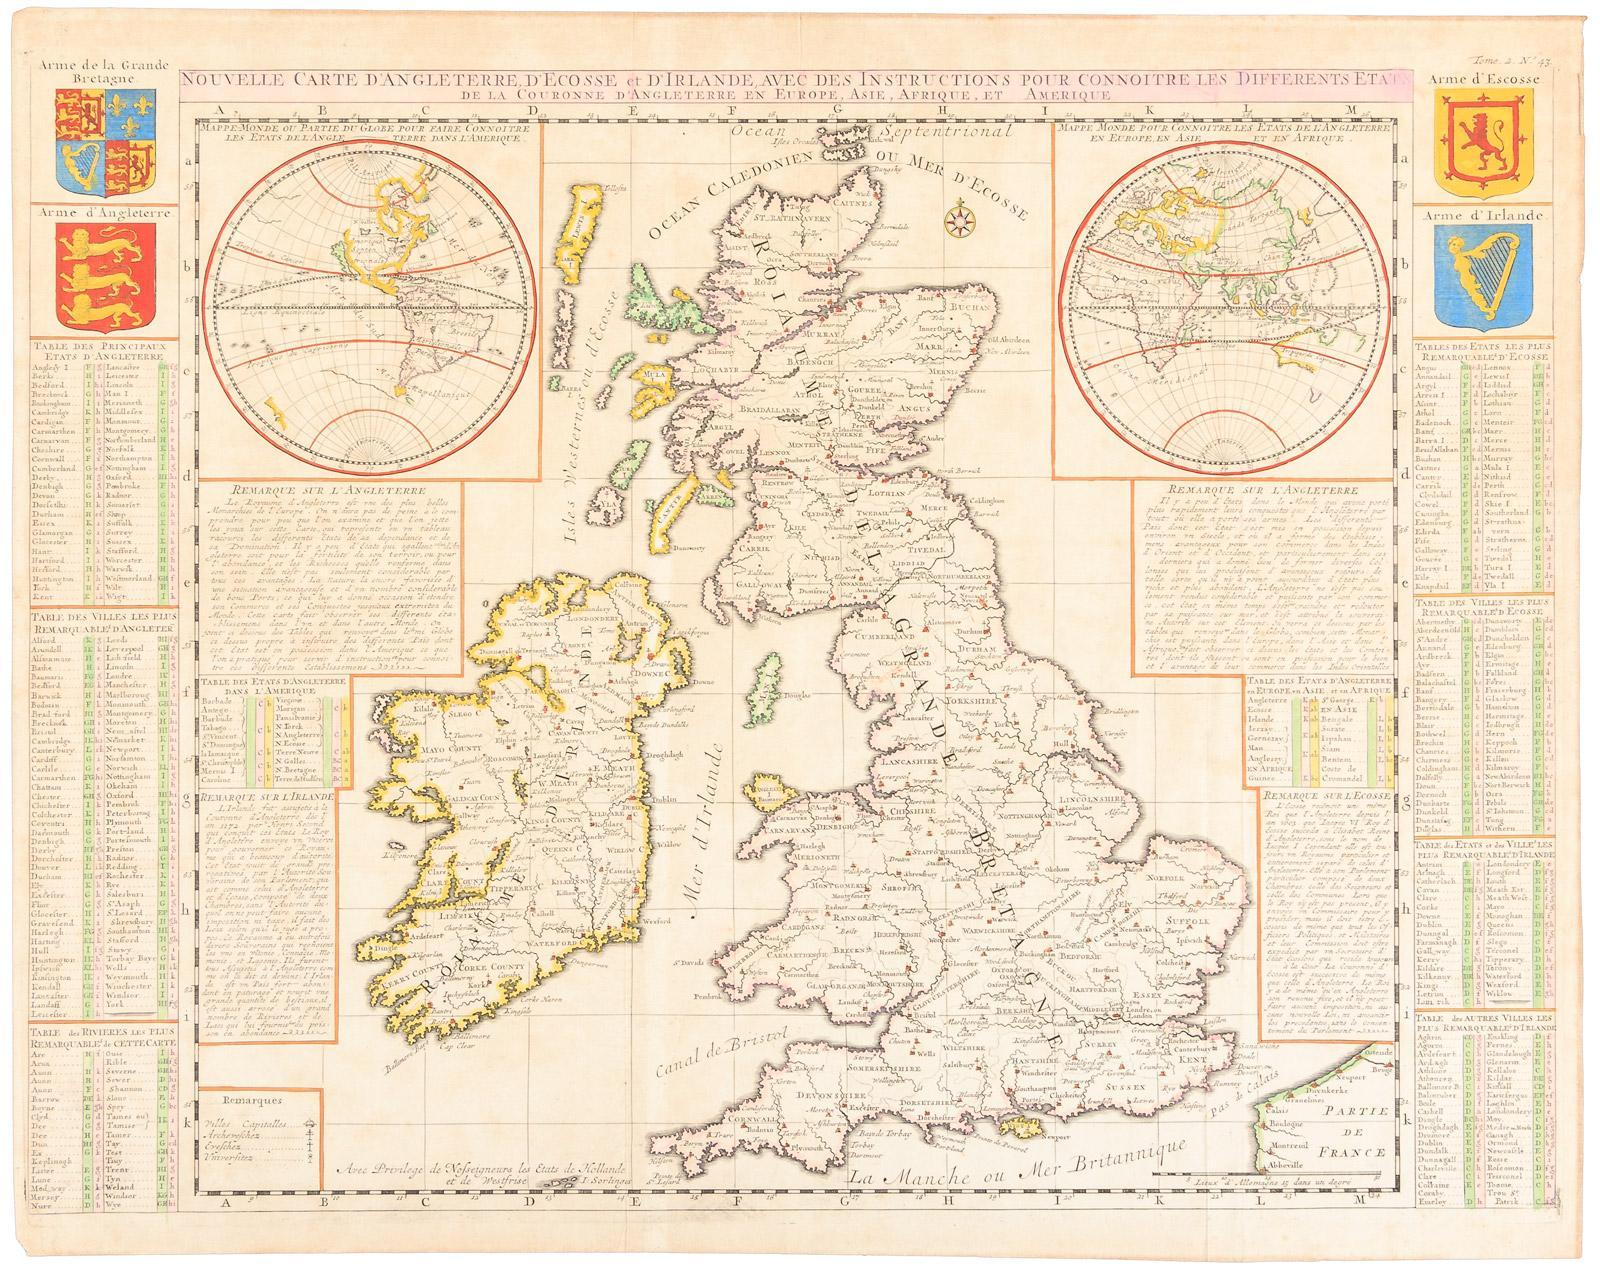 Carte Angleterre Ecosse.Nouvelle Carte D Angleterre D Ecosse Et D Irlande Avec